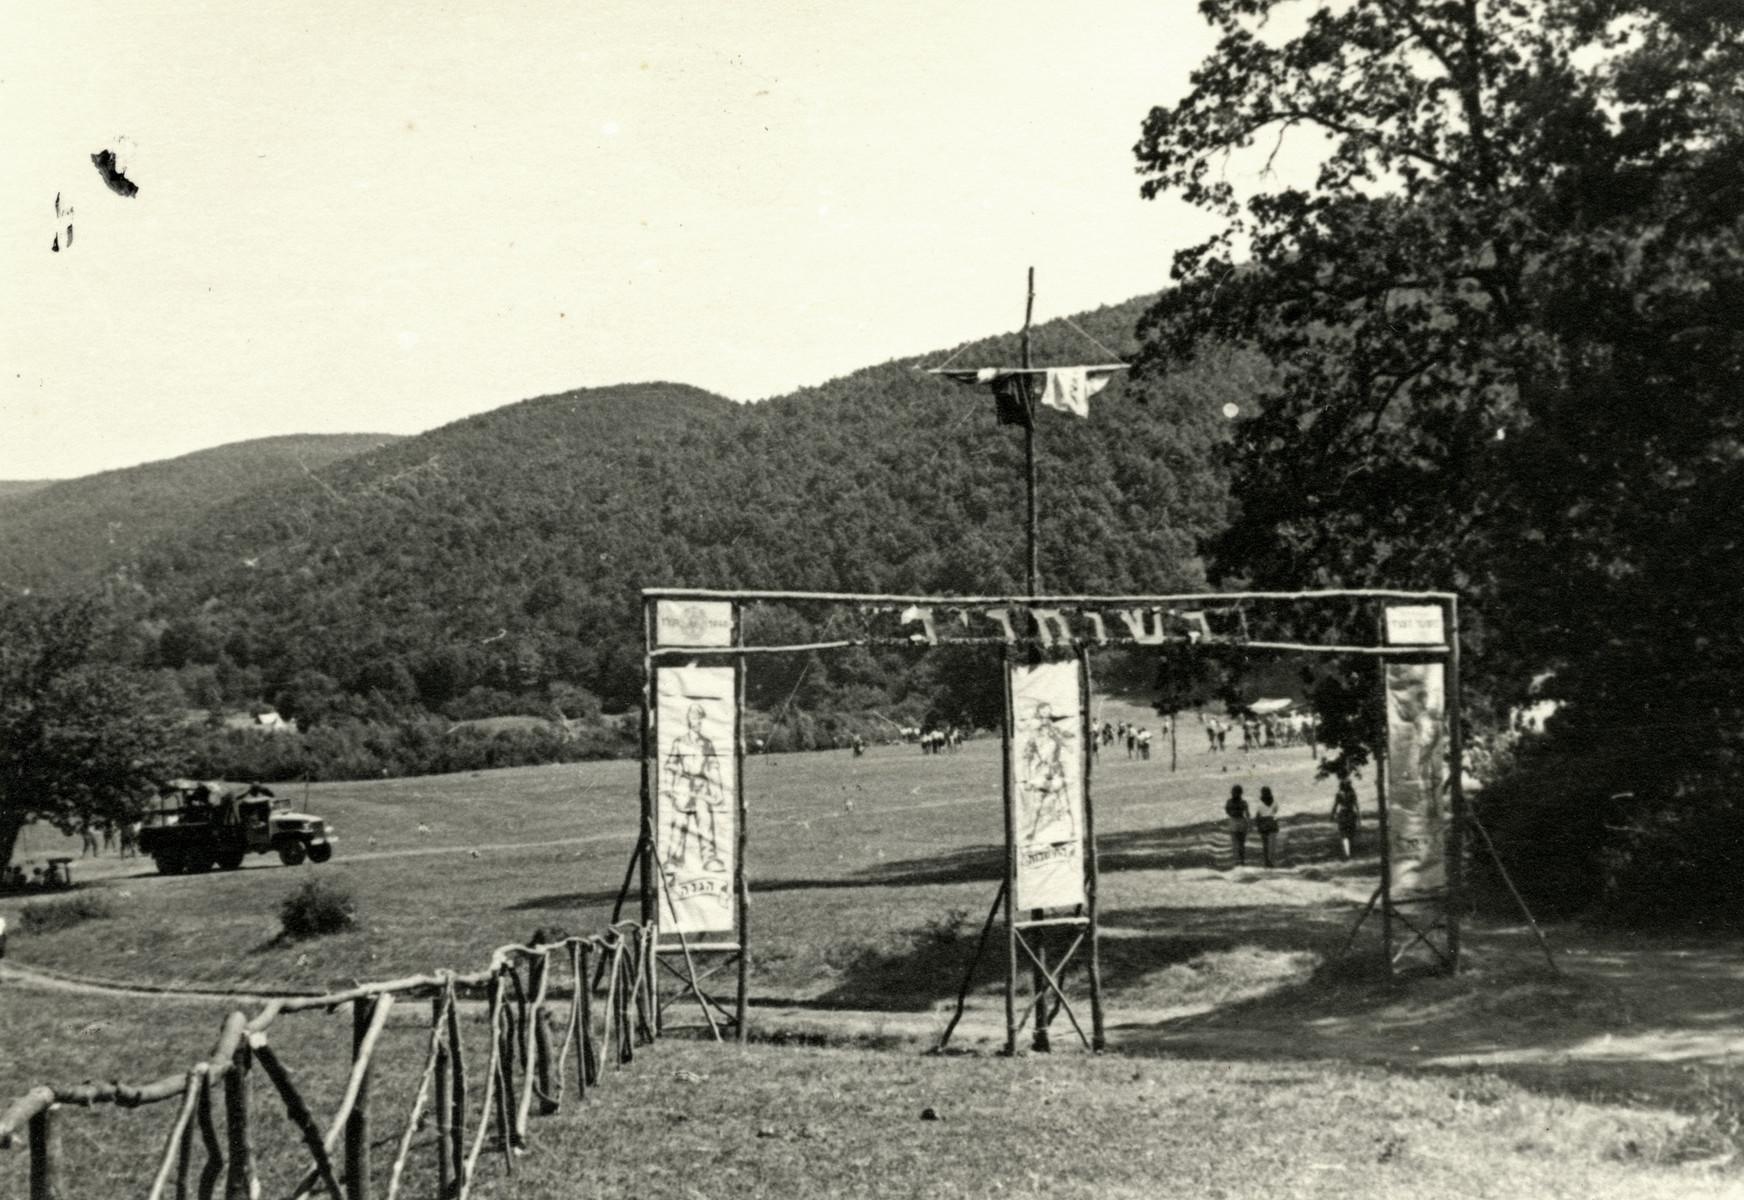 View of the entrance to Shomria, the Shomer Hatzair camp in postwar Hungary.